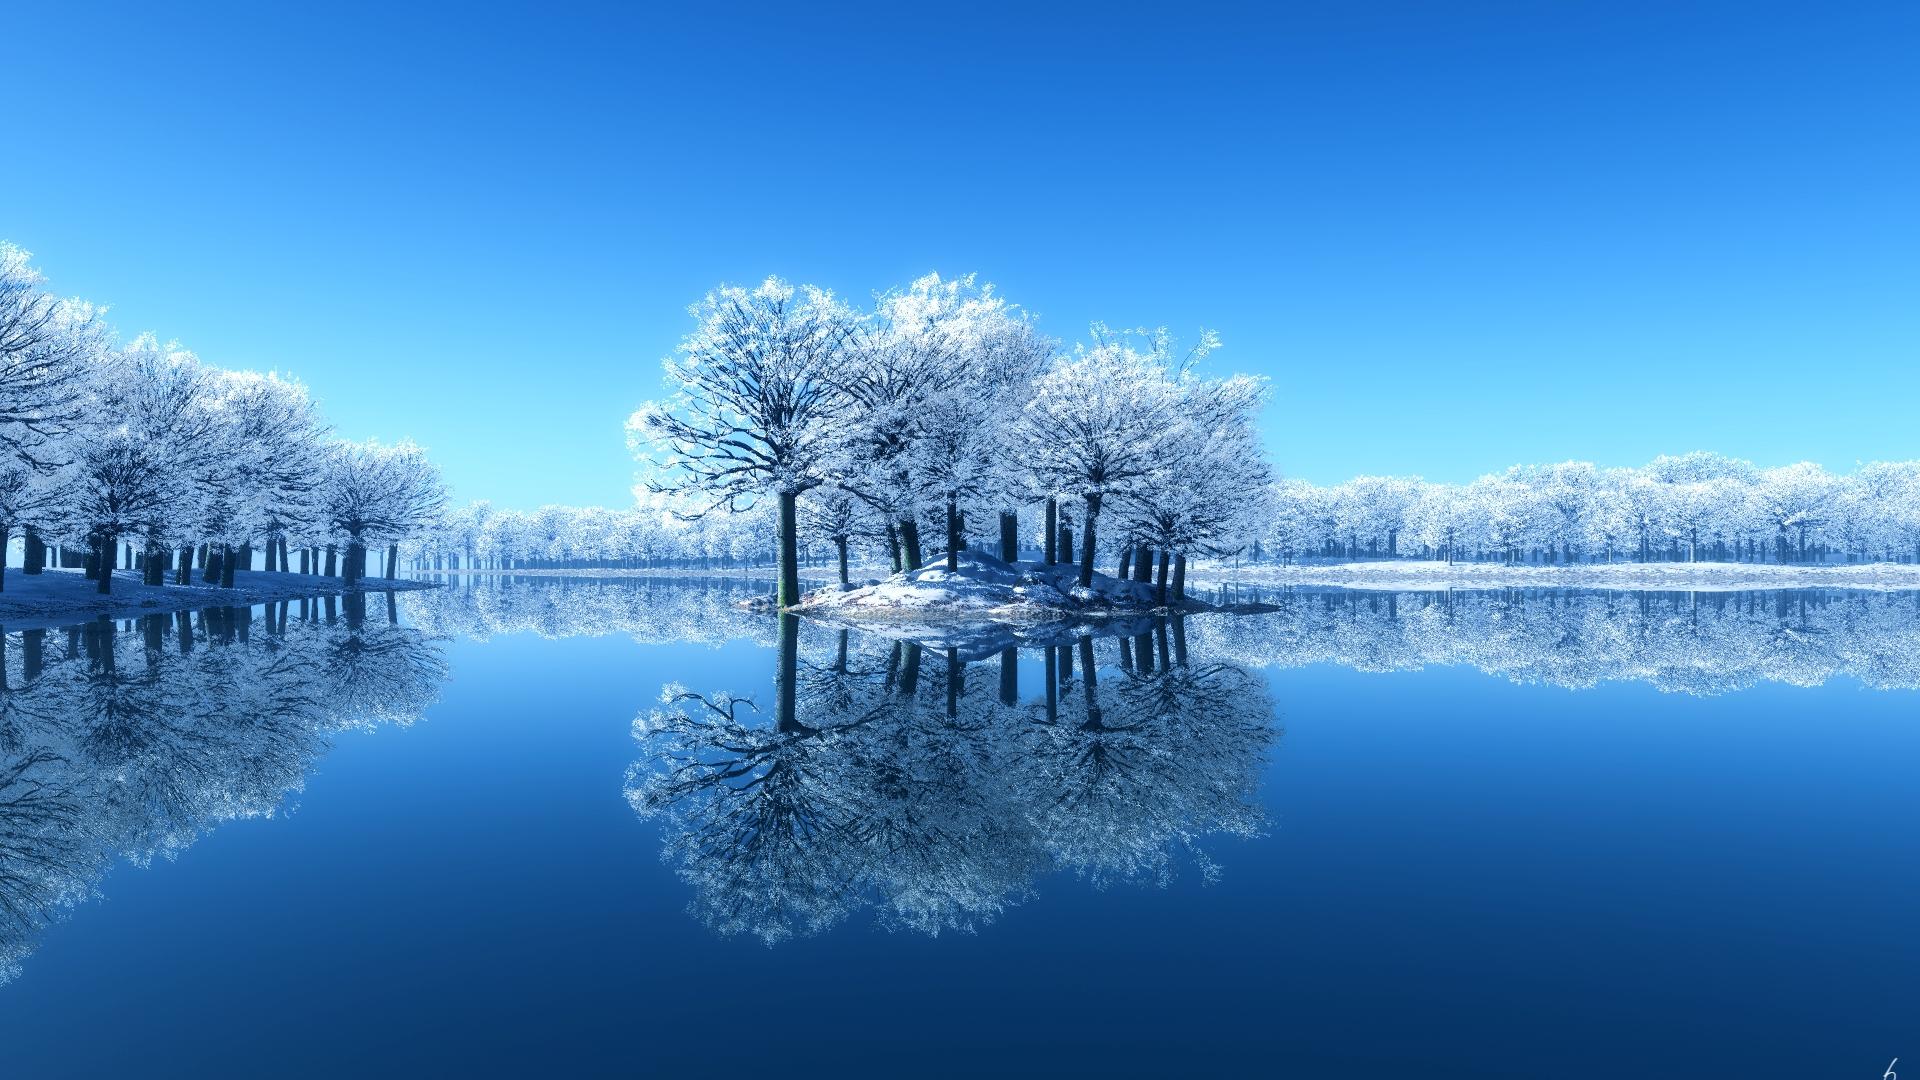 Free download Beautiful Winter Scene Wallpapers 9797 [1920x1200] for your  Desktop, Mobile & Tablet | Explore 49+ Beautiful Winter Scenes Desktop  Wallpapers | Free Winter Scene Wallpaper, Free Winter Snow Scenes Wallpaper,